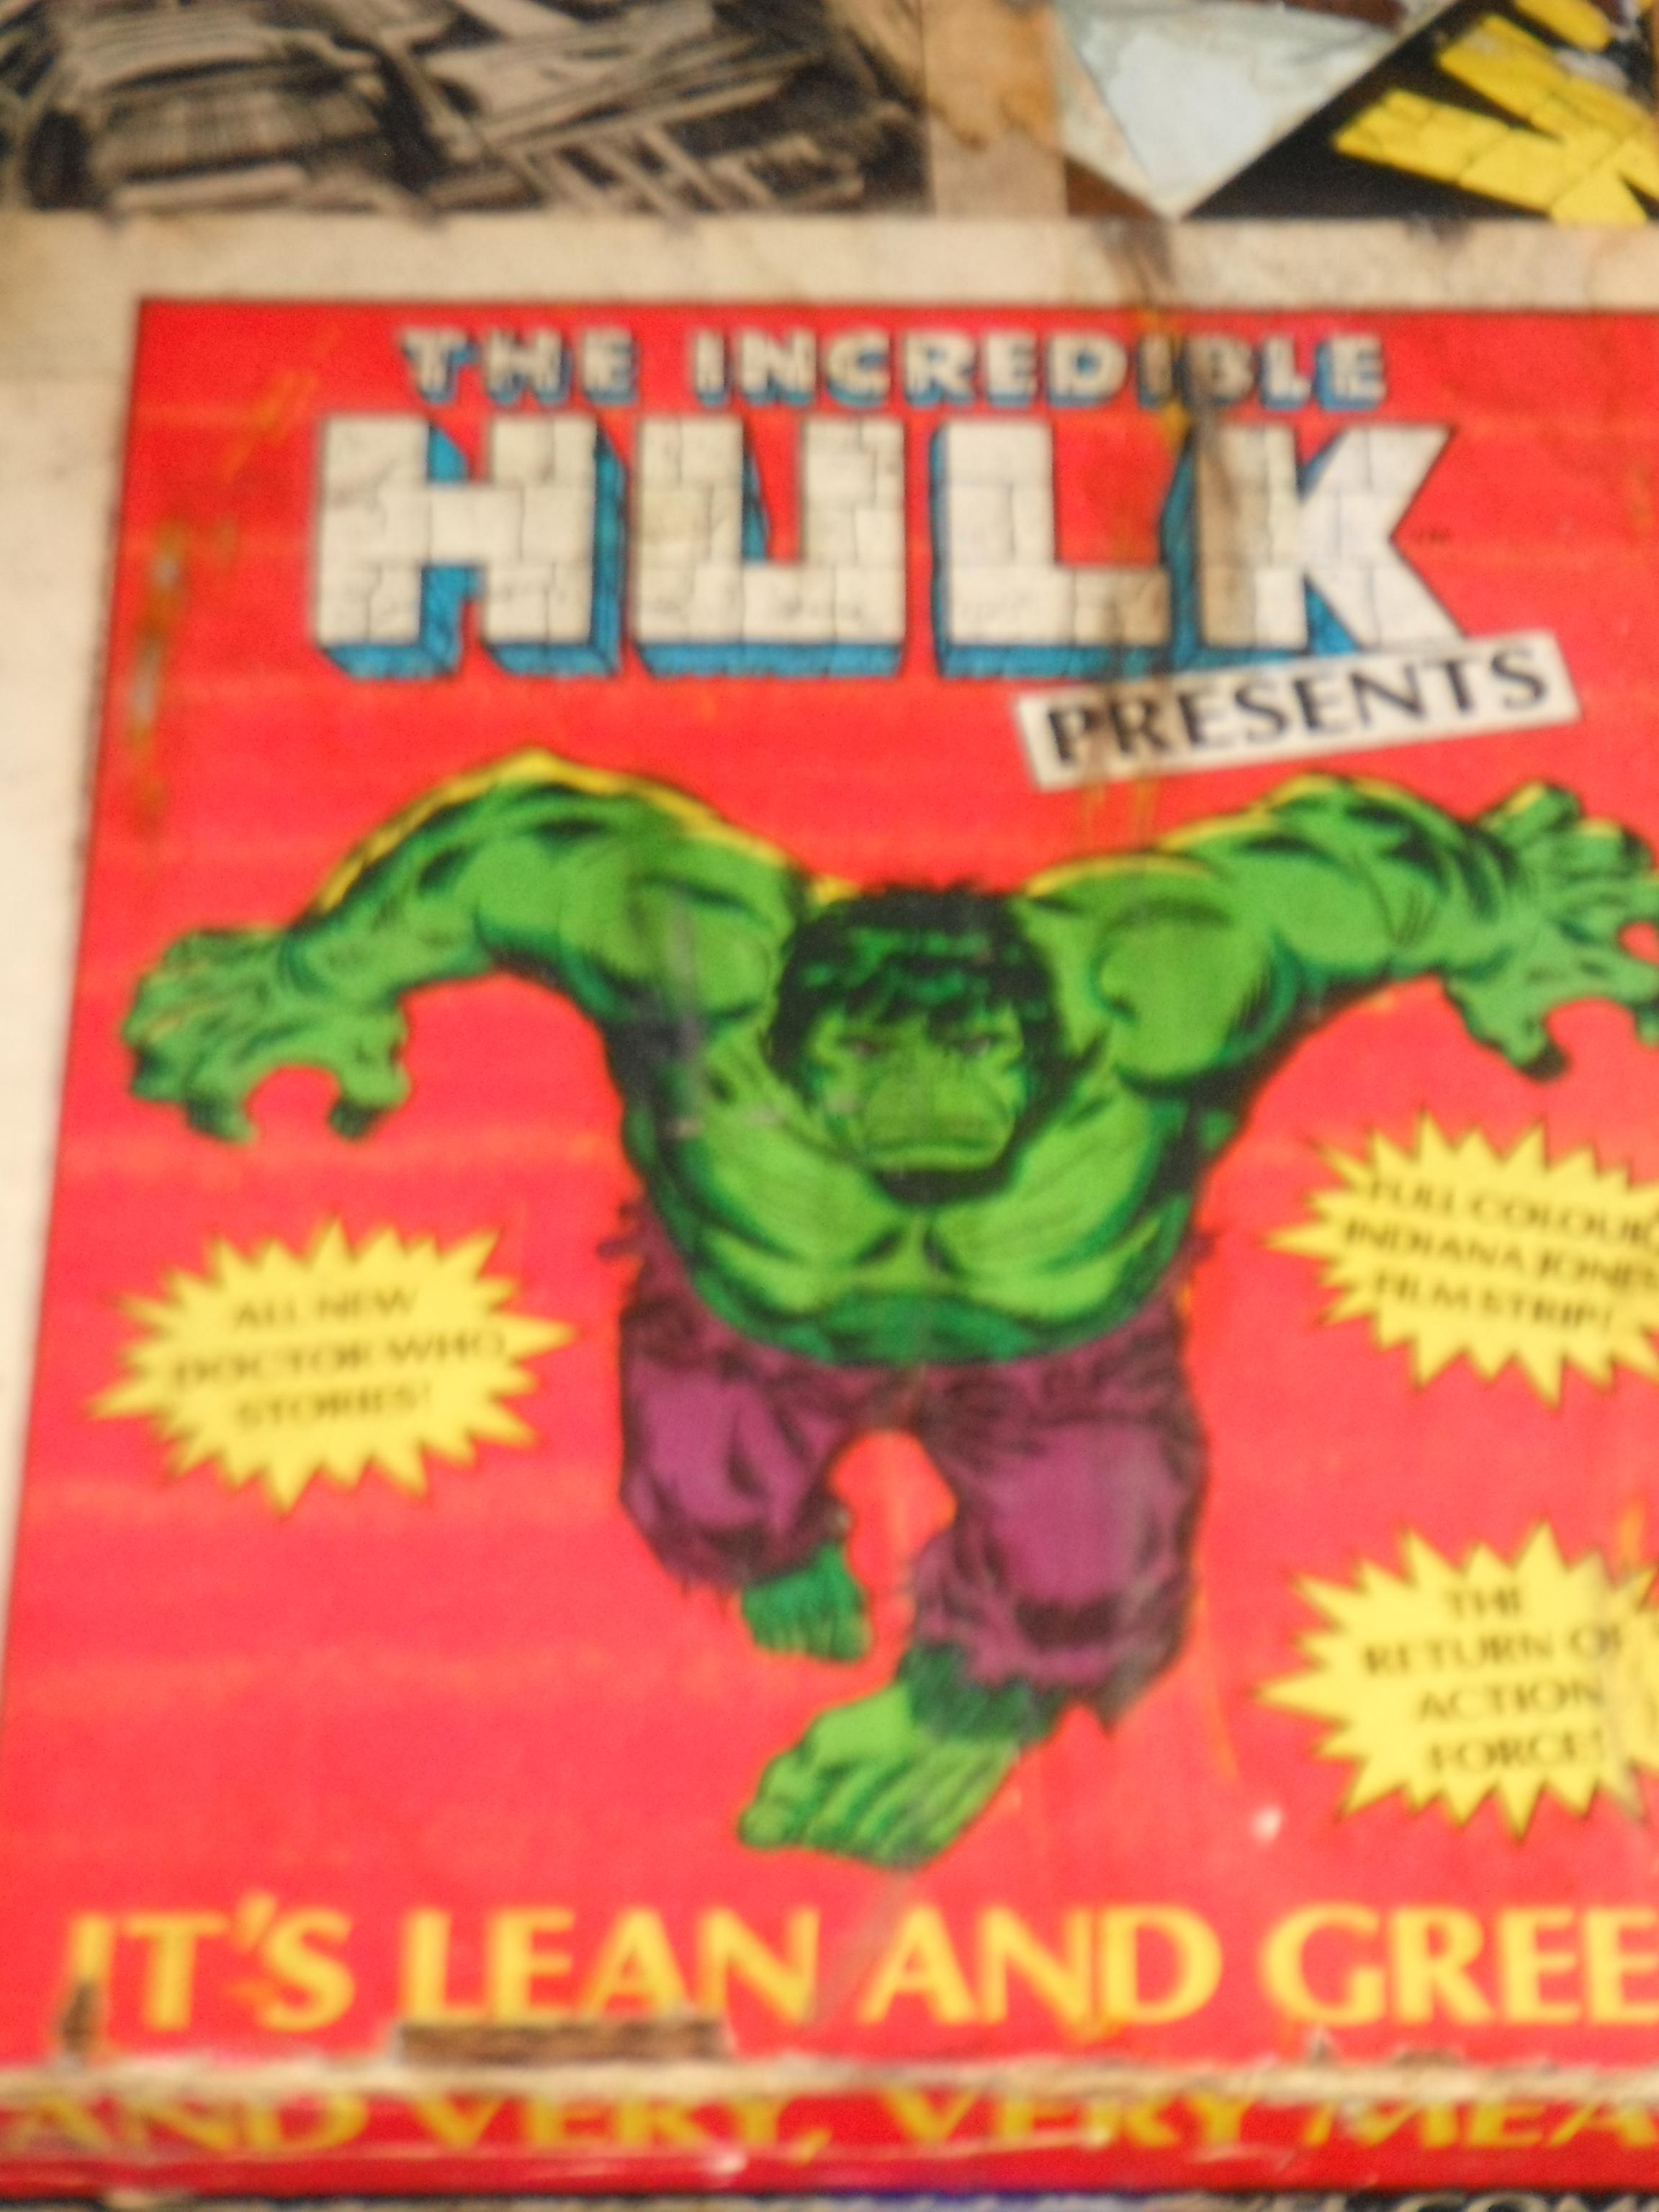 Photo taken by me – Hulk Comic cover – FAB Café, Manchester